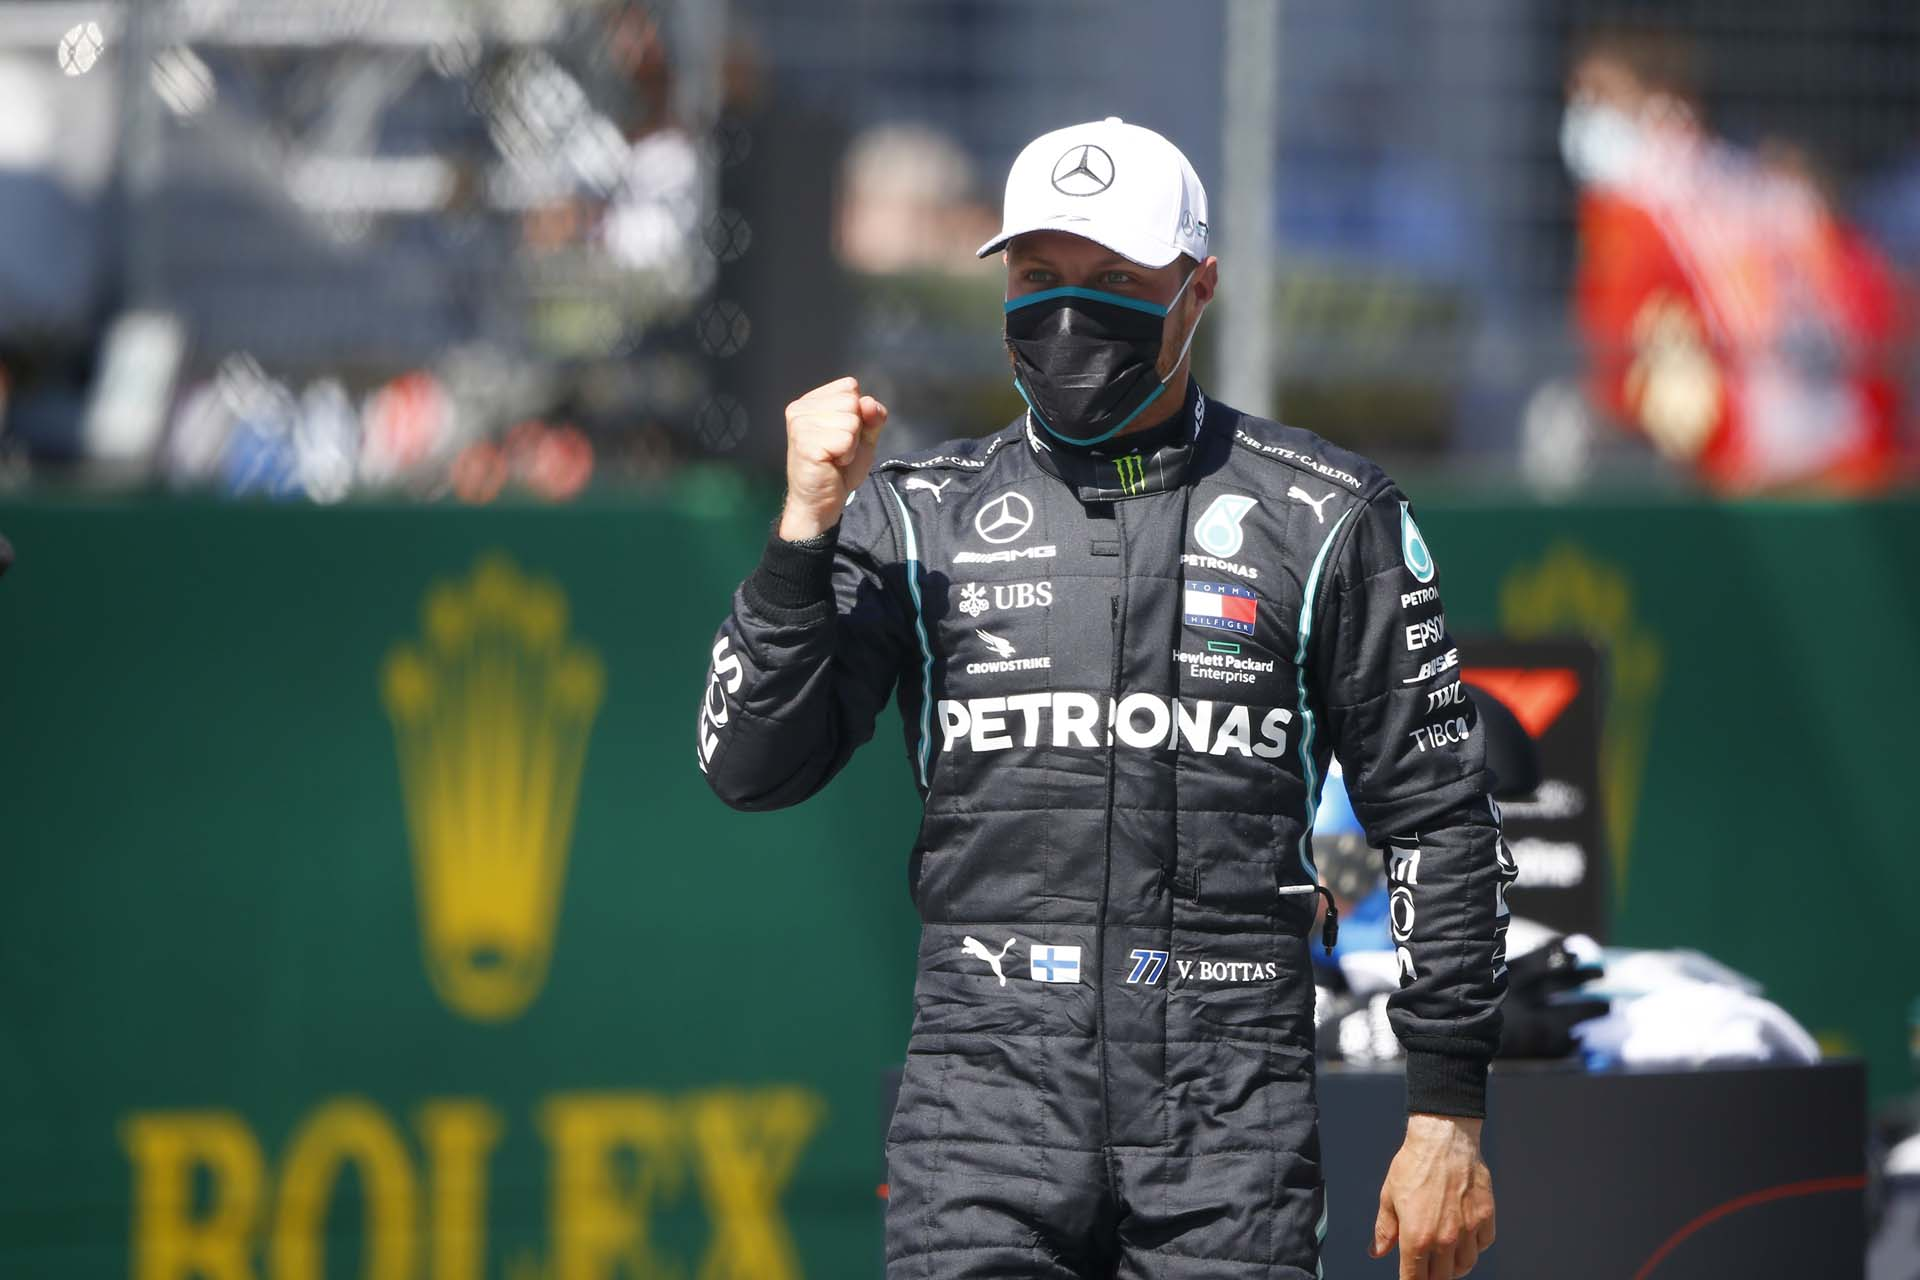 2020 Austrian Grand Prix, Saturday - LAT Images